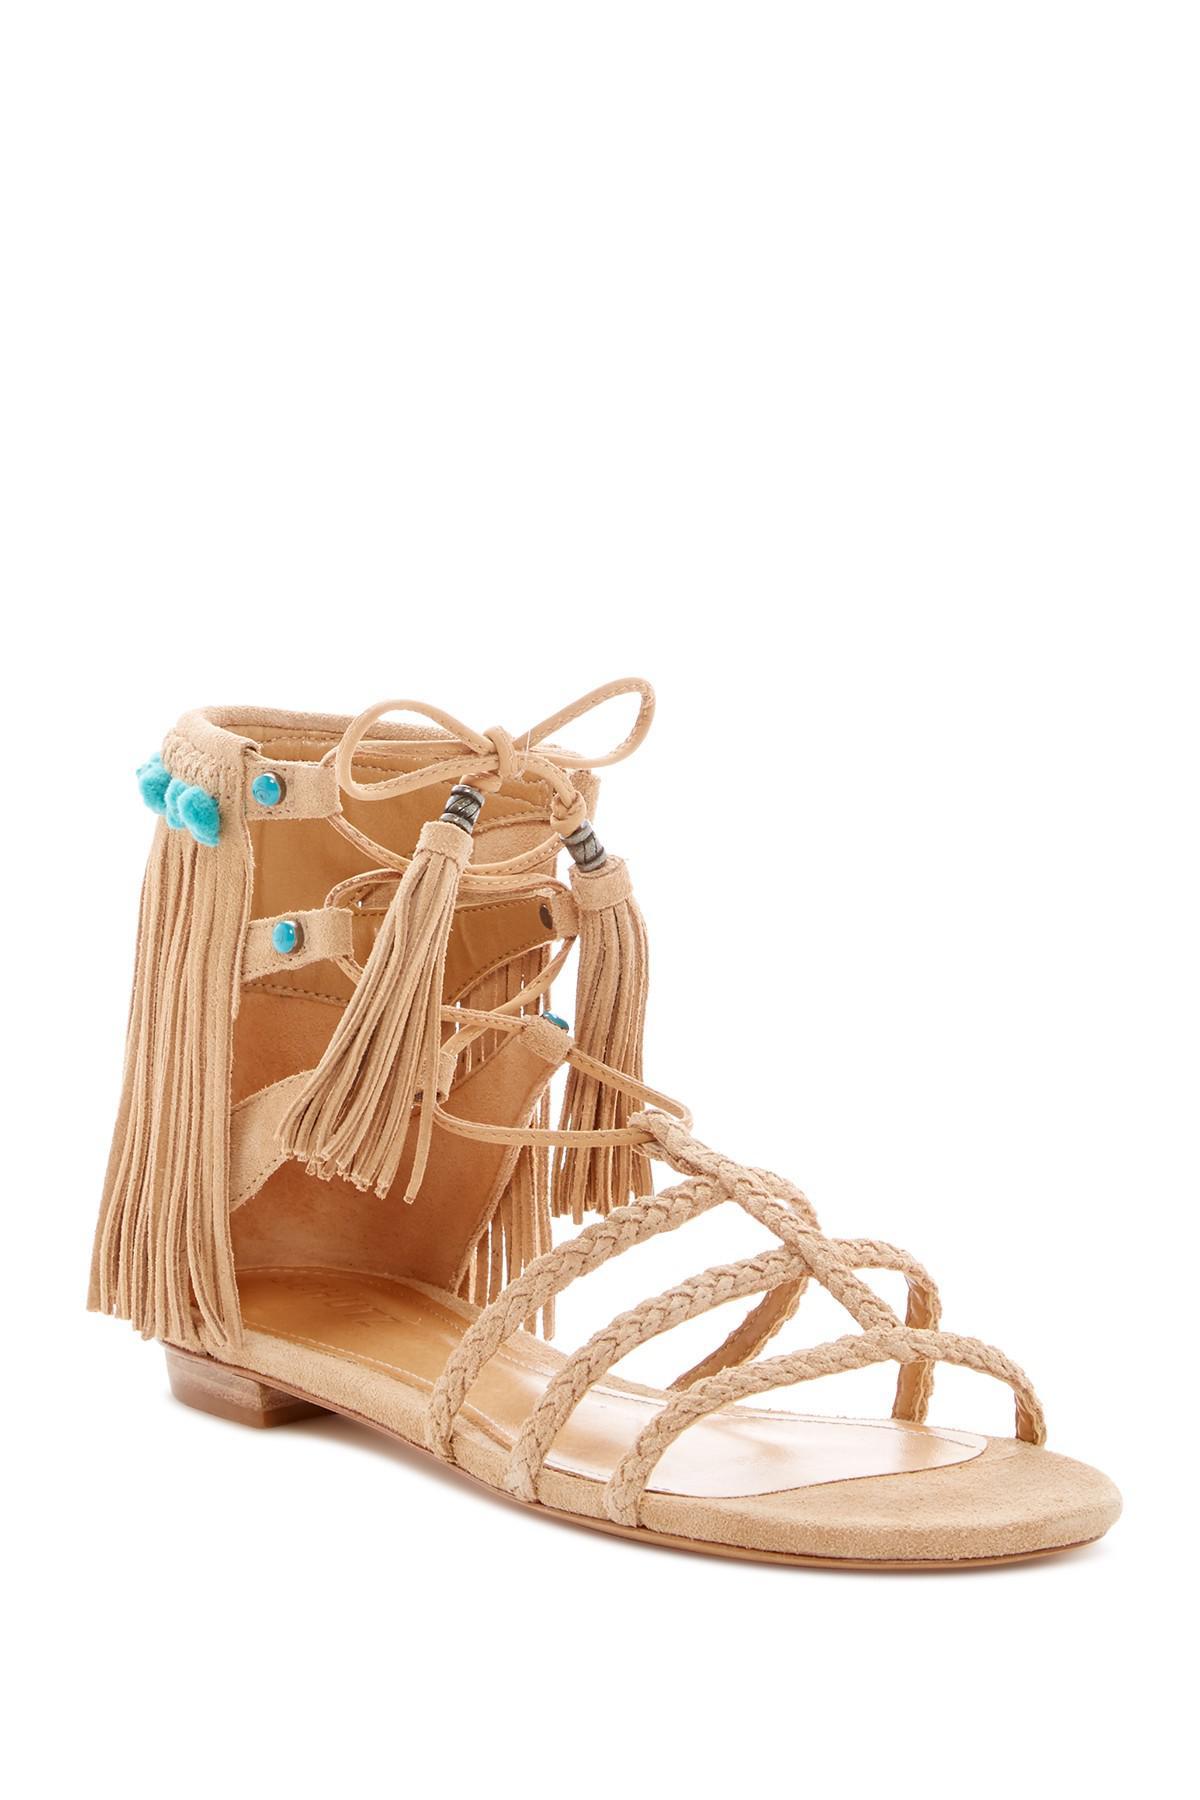 954d0c442bb Lyst - Schutz Shuli Fringe Gladiator Sandal in Brown